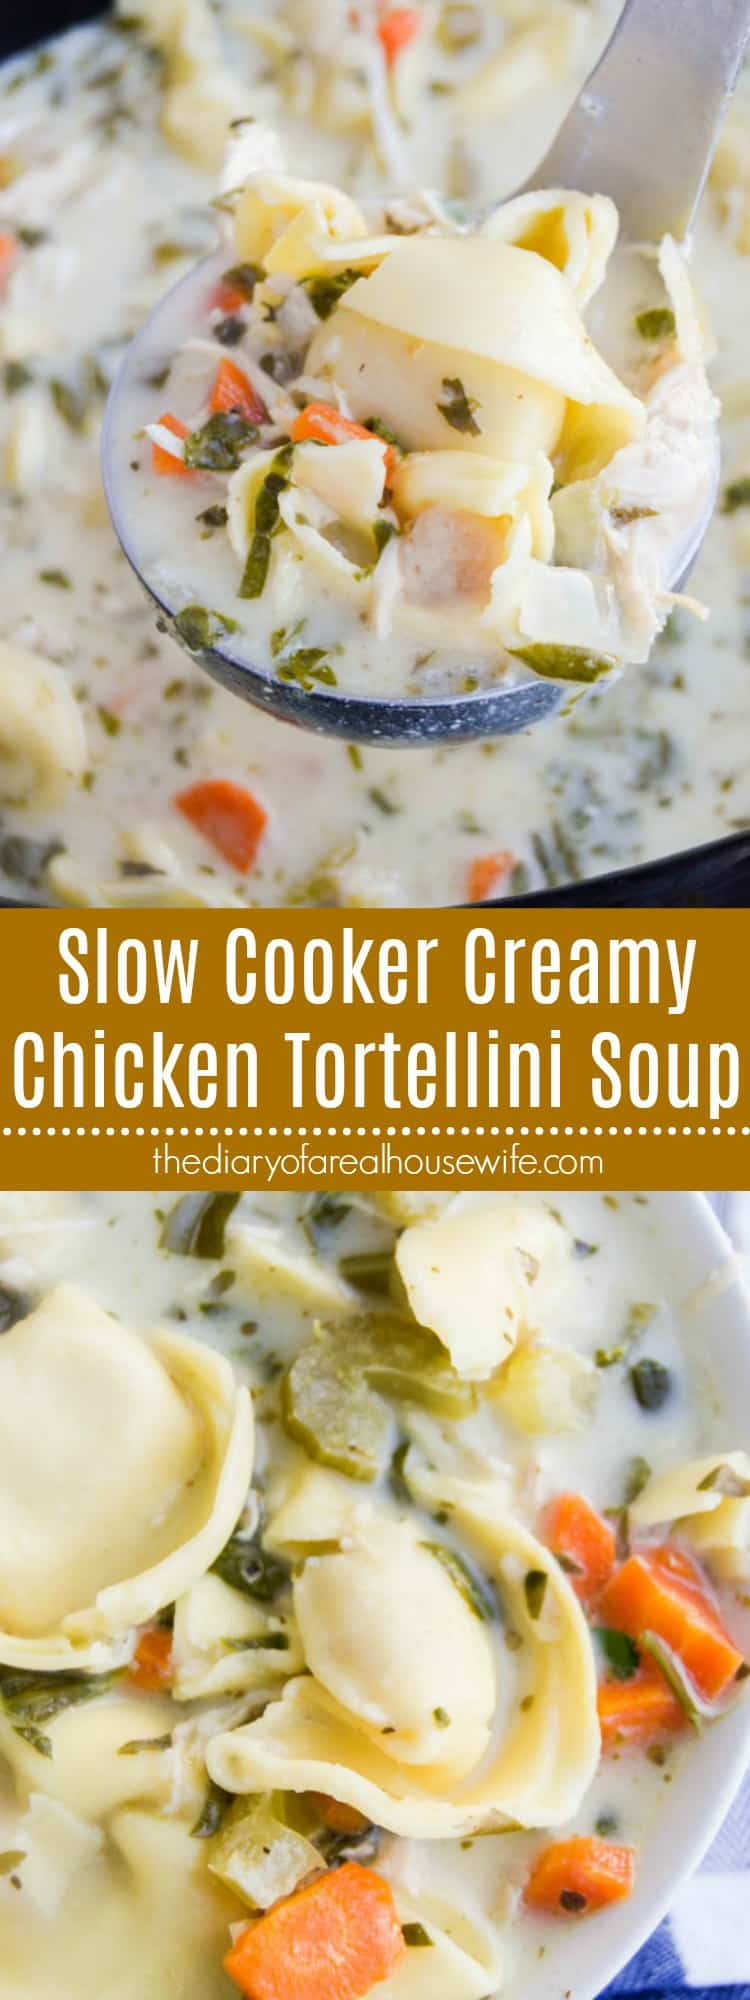 Slow Cooker Creamy Chicken Tortellini Soup